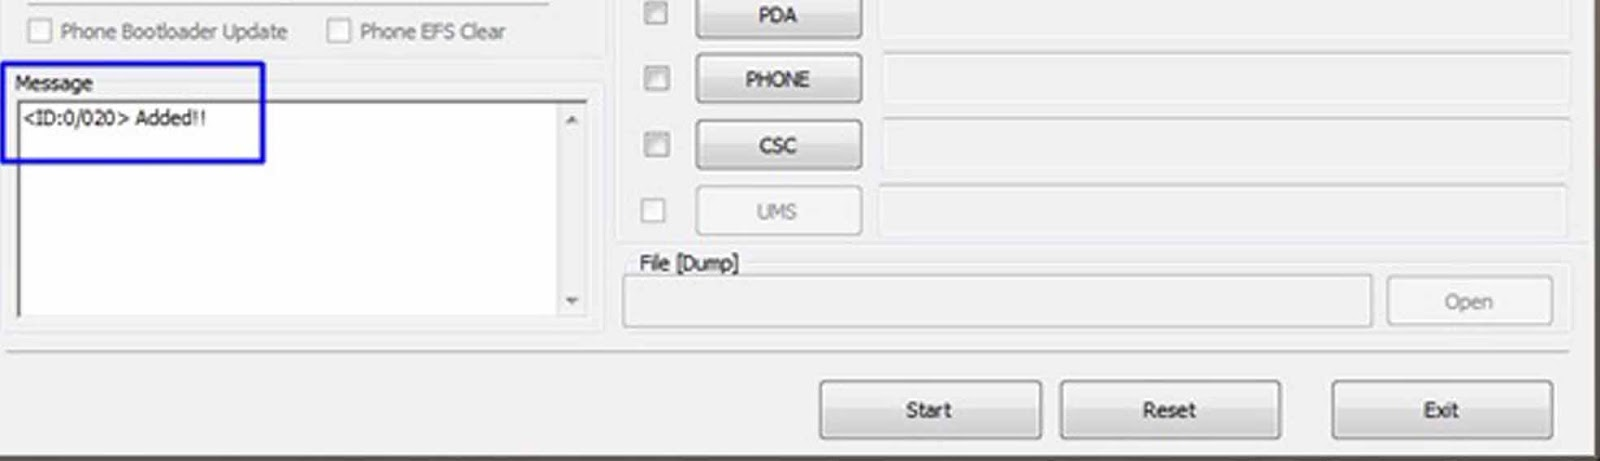 11. Kemudian tklik PDA pada Odin, lalu cari file (touch.tar) yang ...